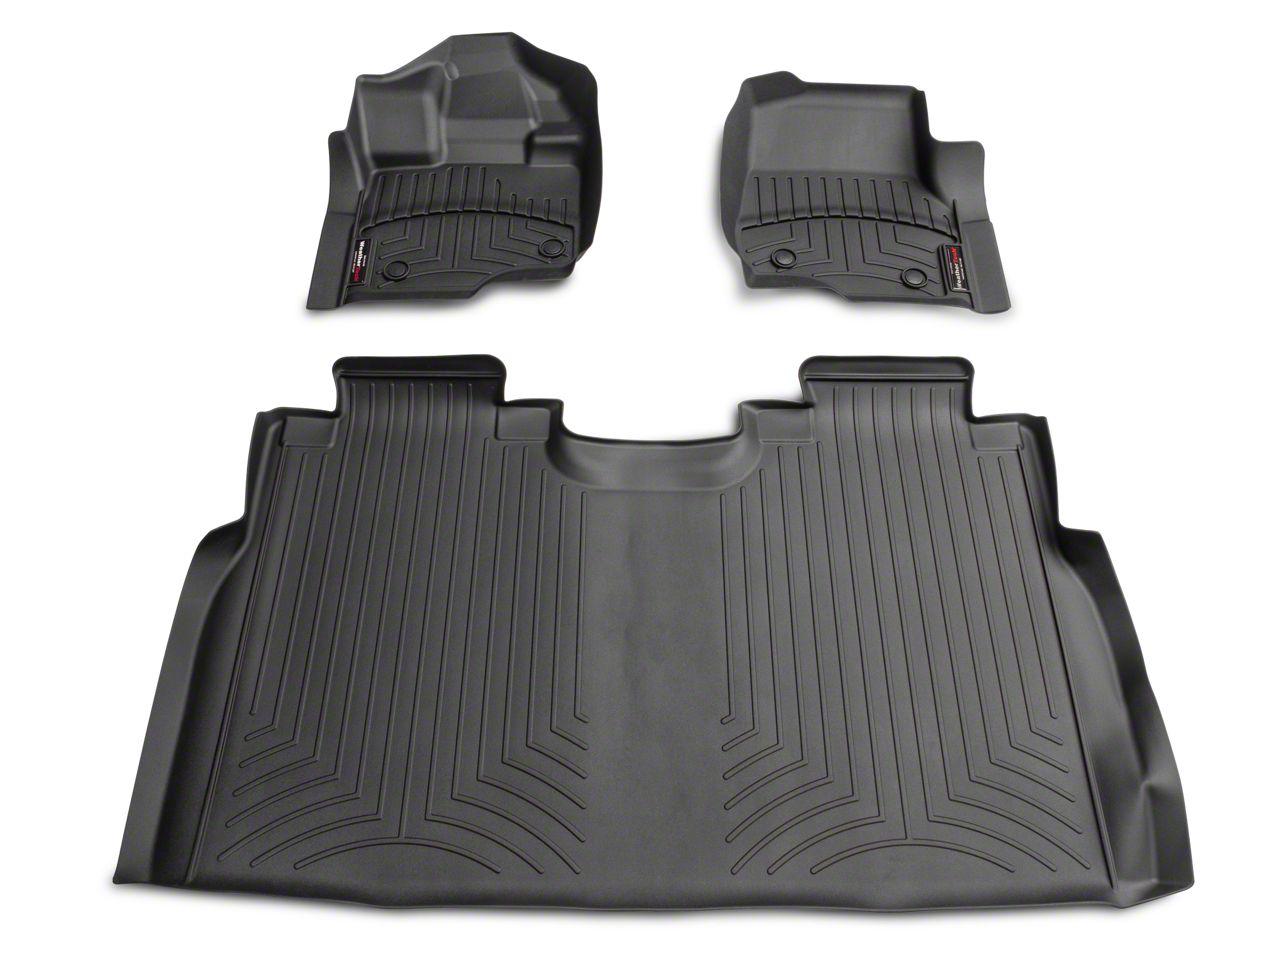 Weathertech DigitalFit Front & Rear Floor Liners - Black (15-19 F-150 SuperCrew w/ bucket seats)